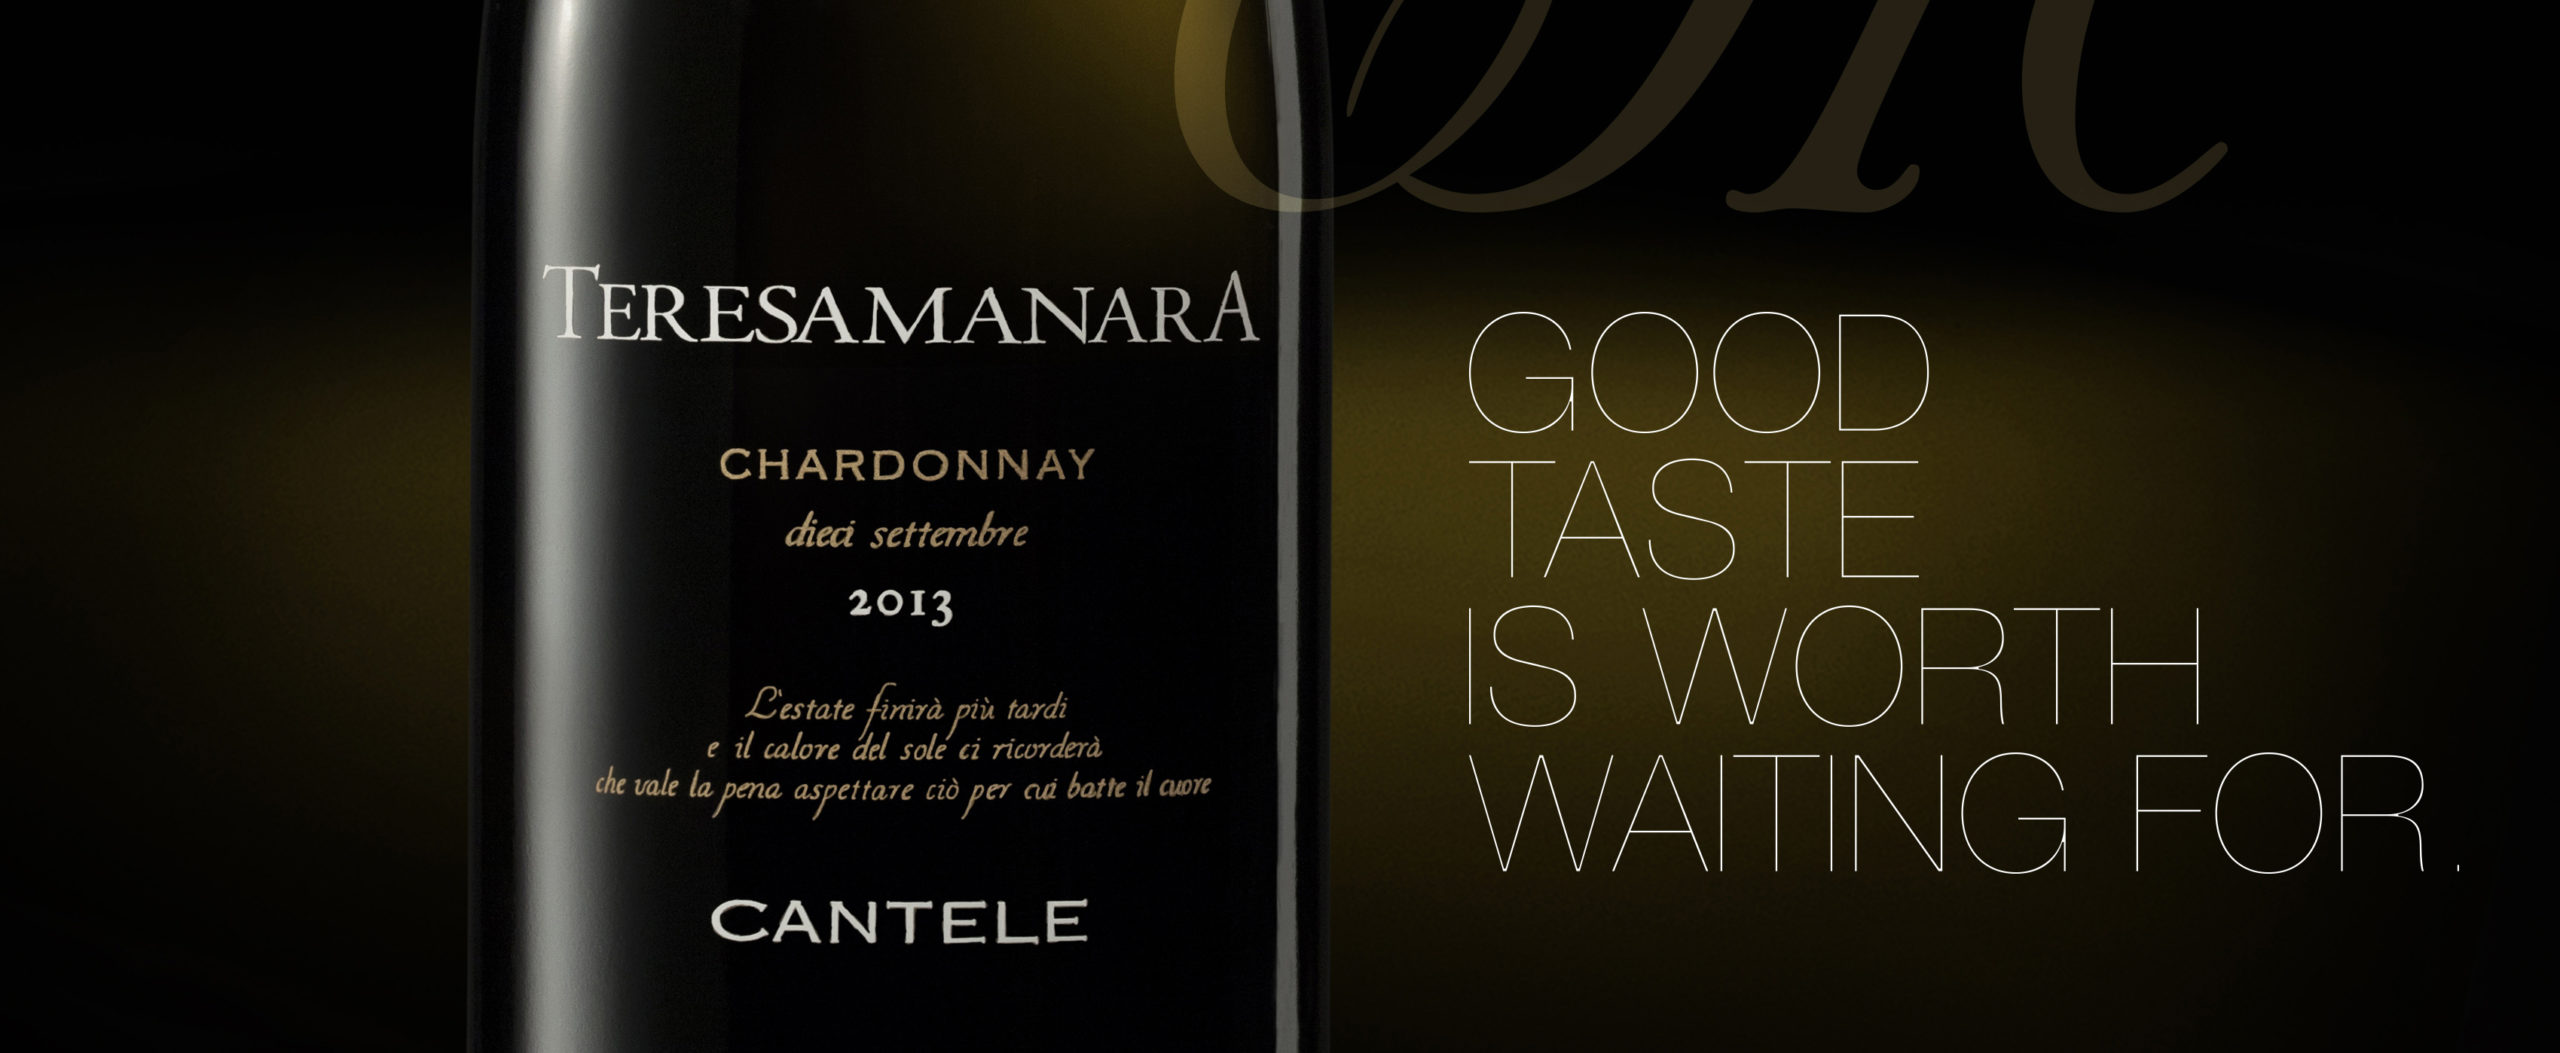 "Teresa Manara Chardonnay ""Dieci Settembre"" (""September 10"")"